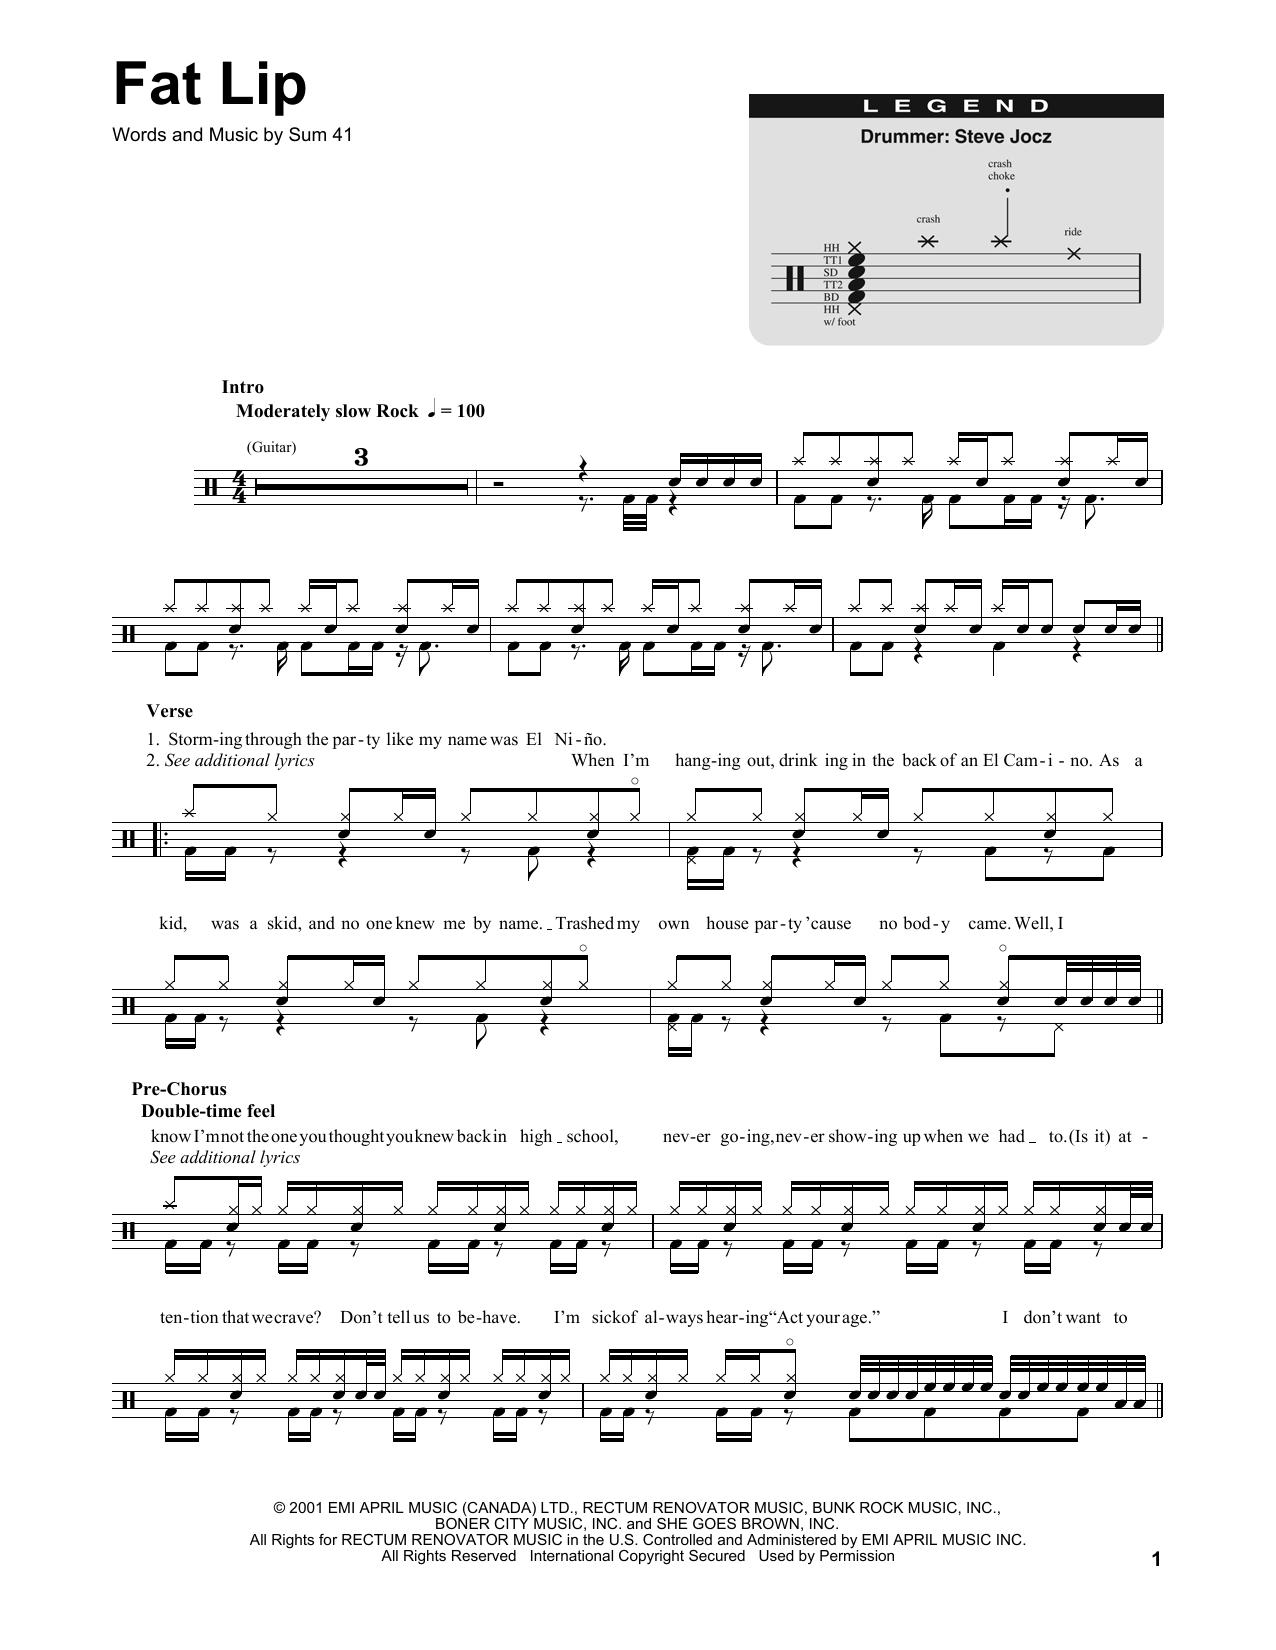 Sheet Music Digital Files To Print Licensed Sum 41 Digital Sheet Music